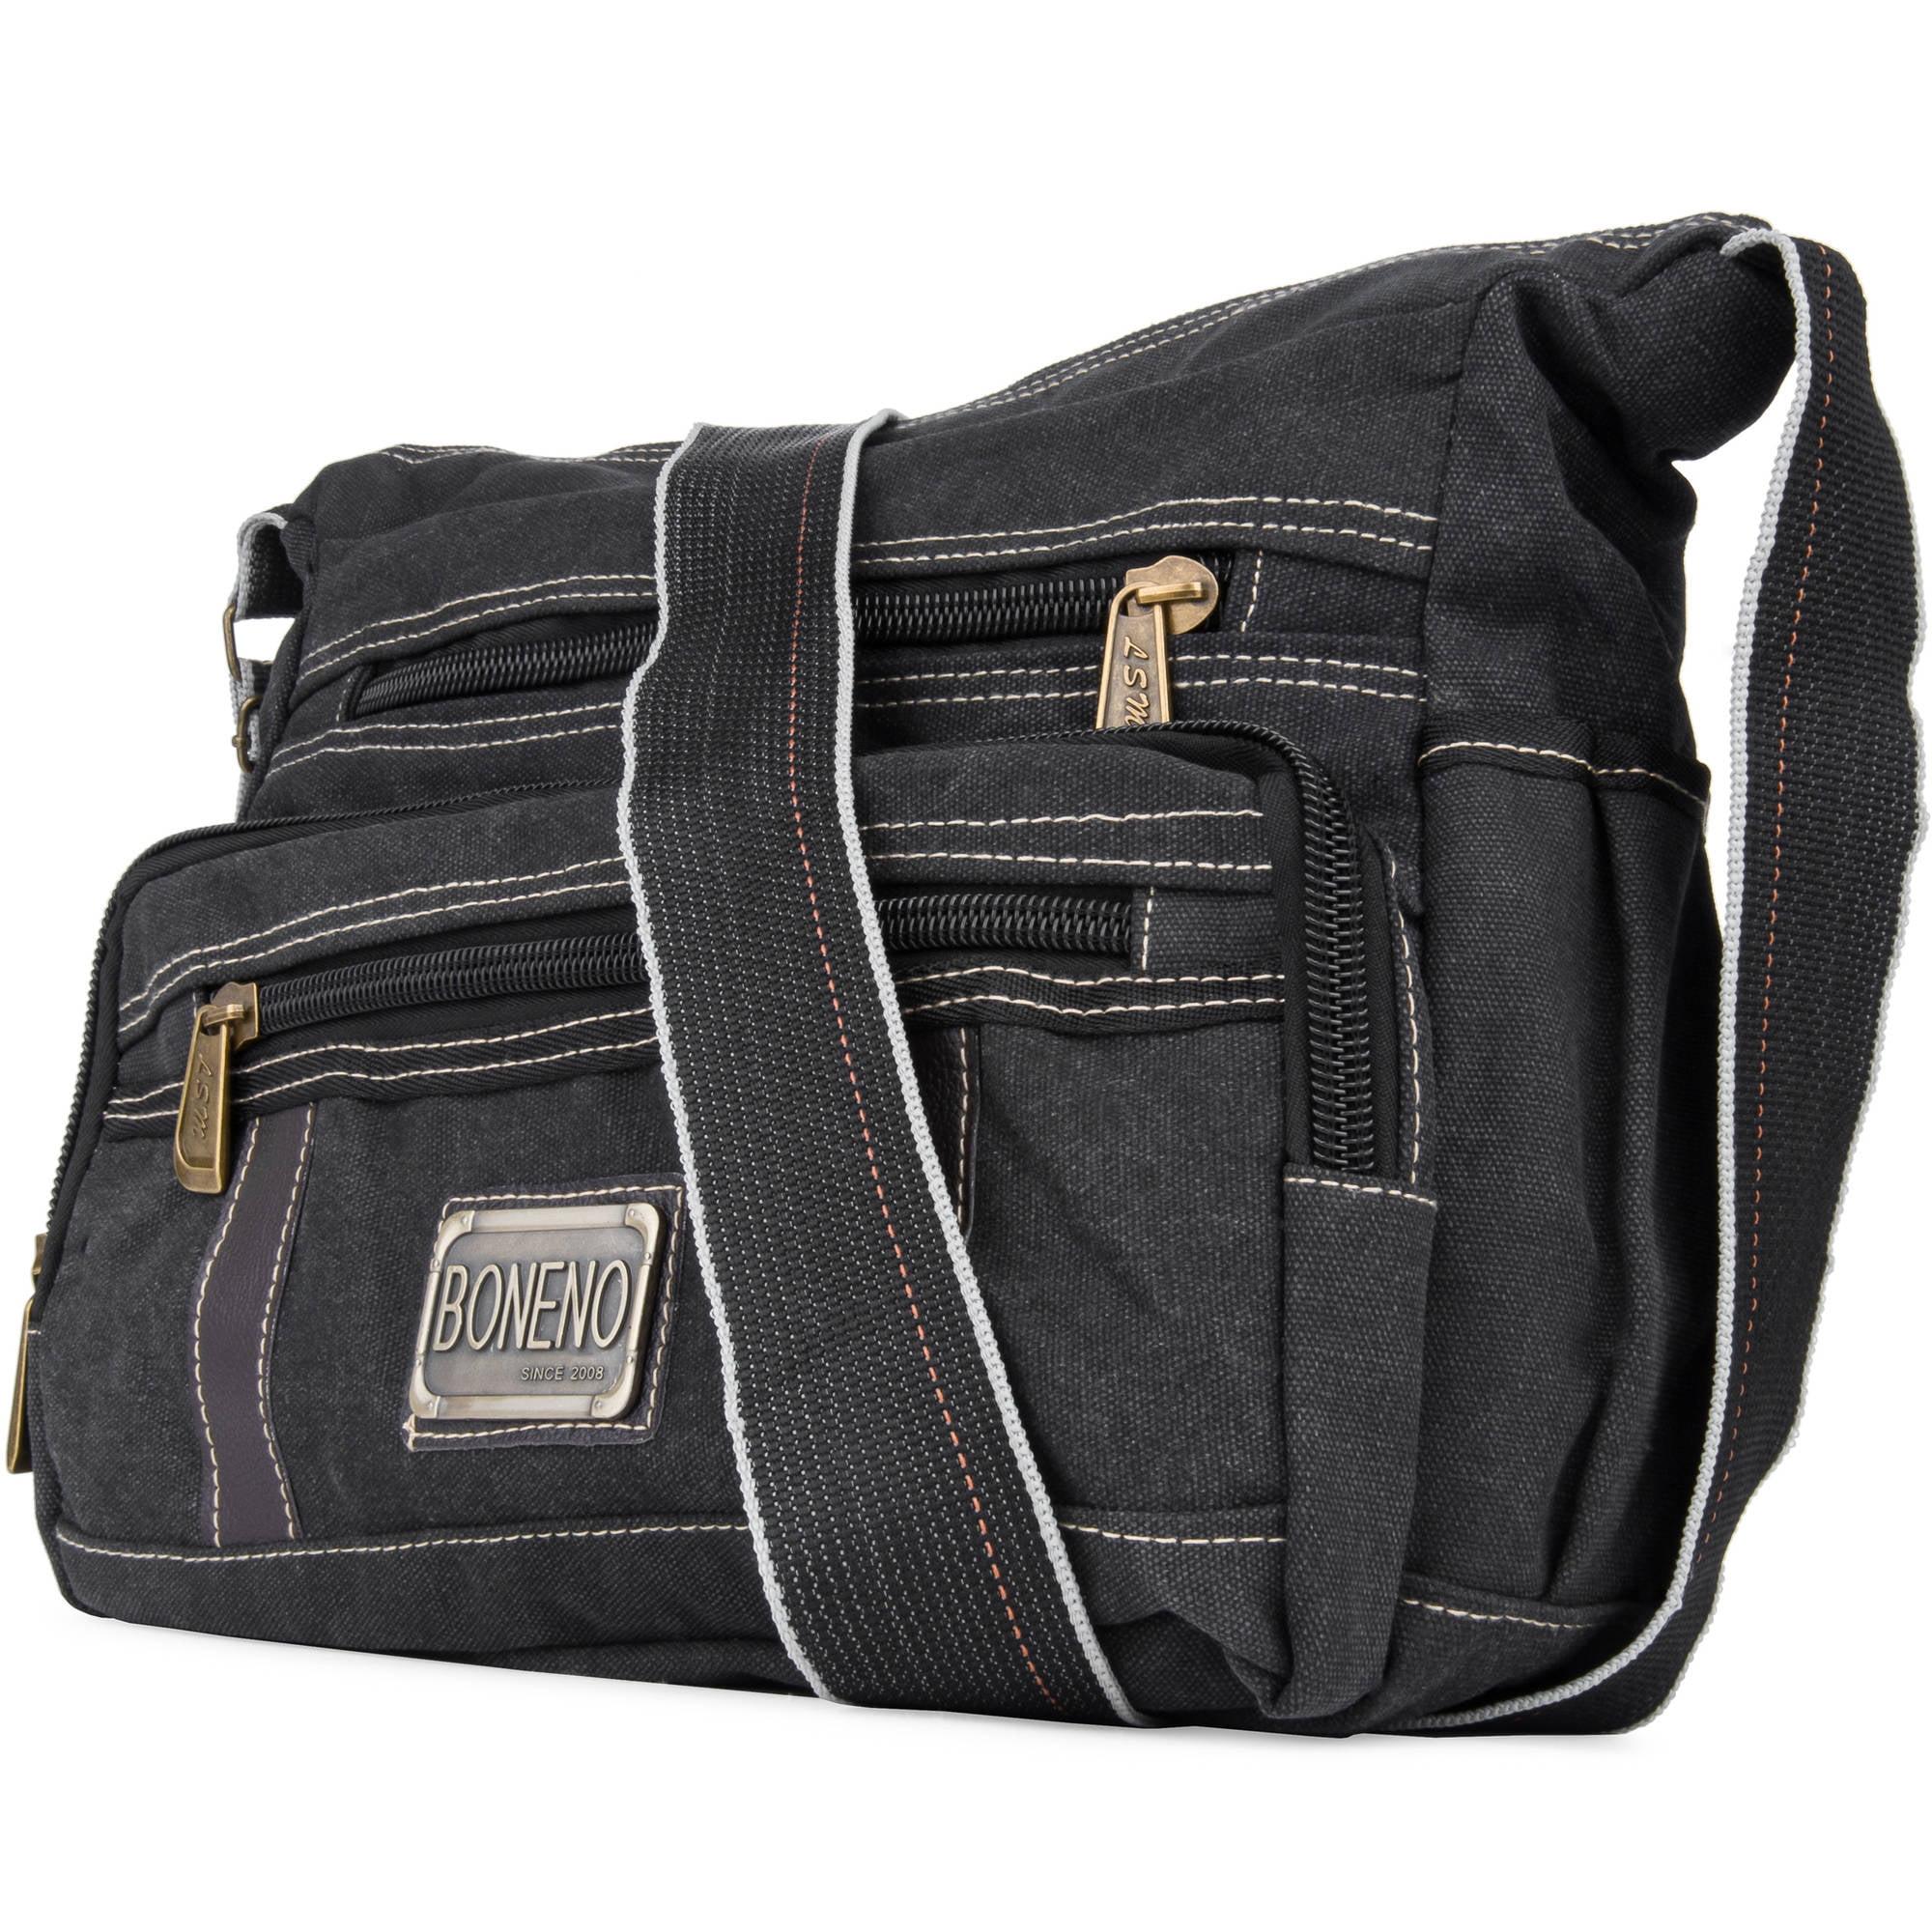 Messenger Bags - Walmart.com